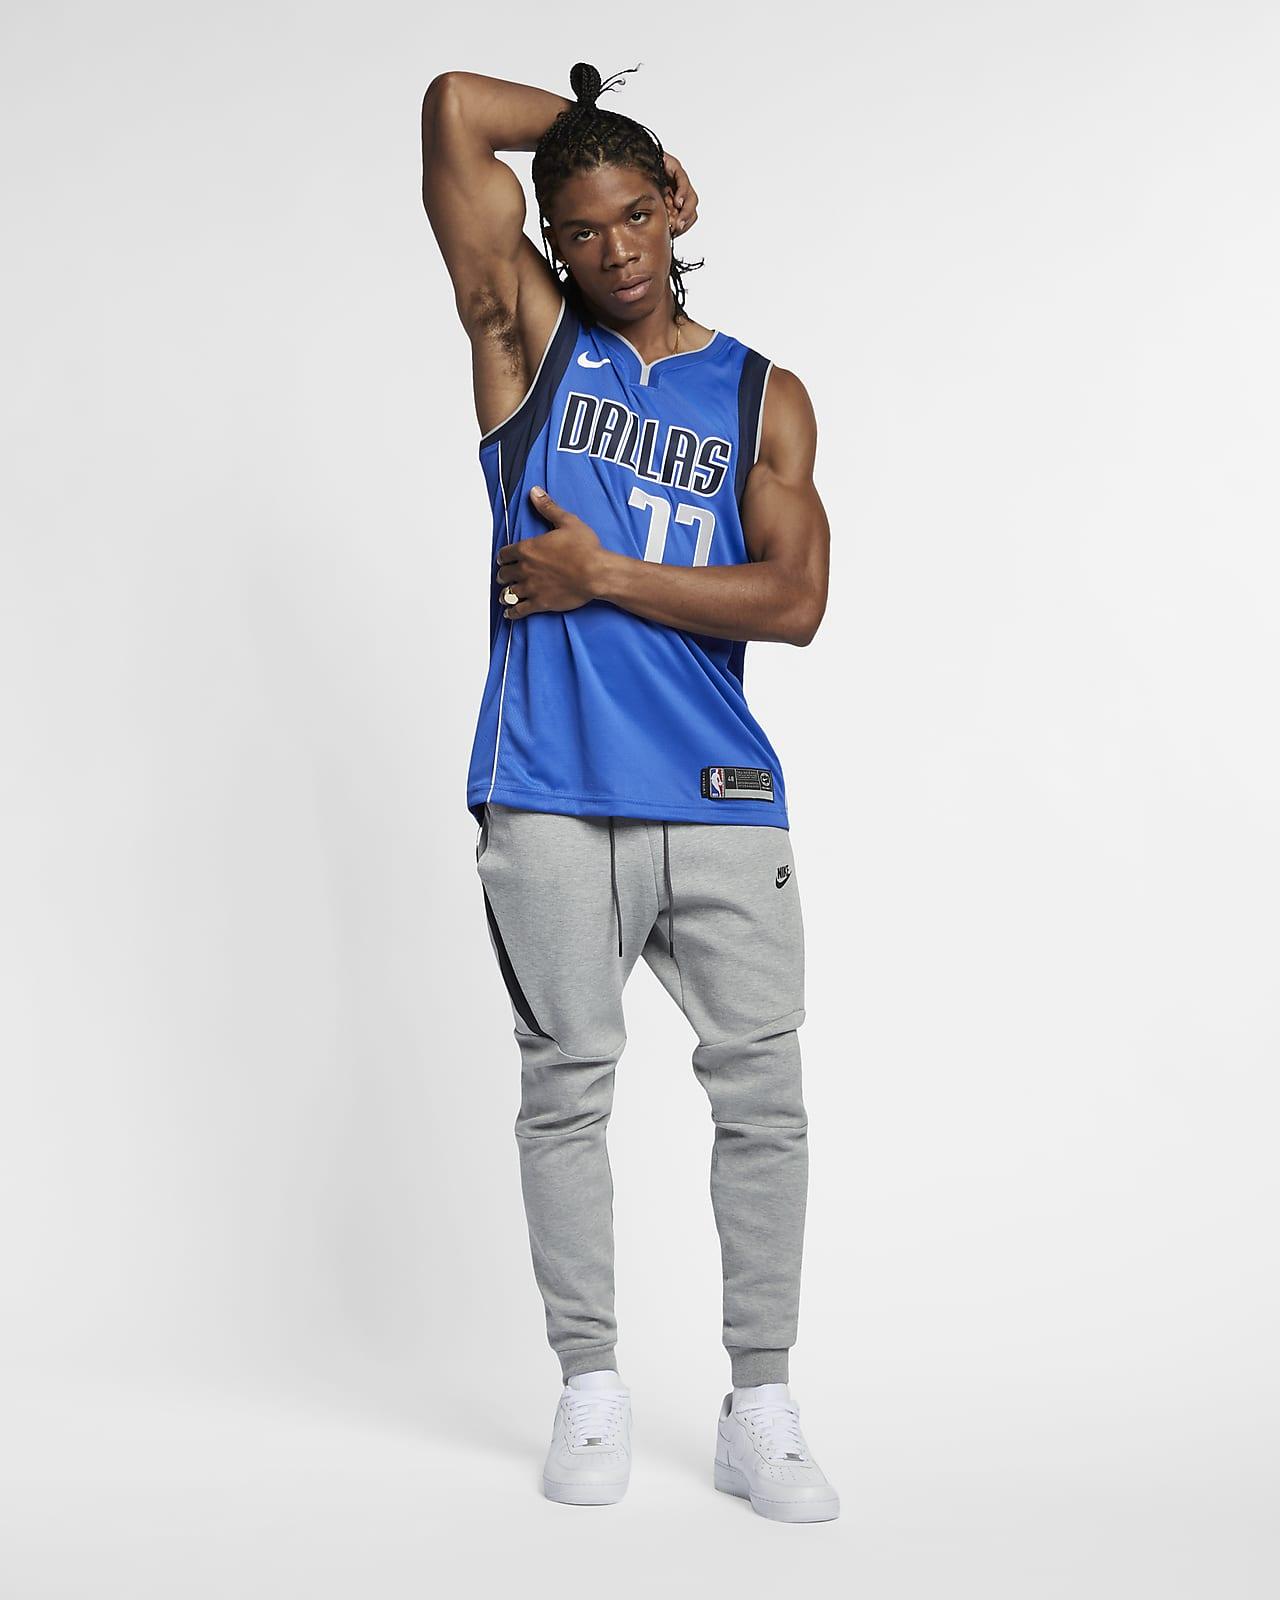 Maillot d'équipe Nike NBA Swingman Luka Doncic Mavericks Icon Edition